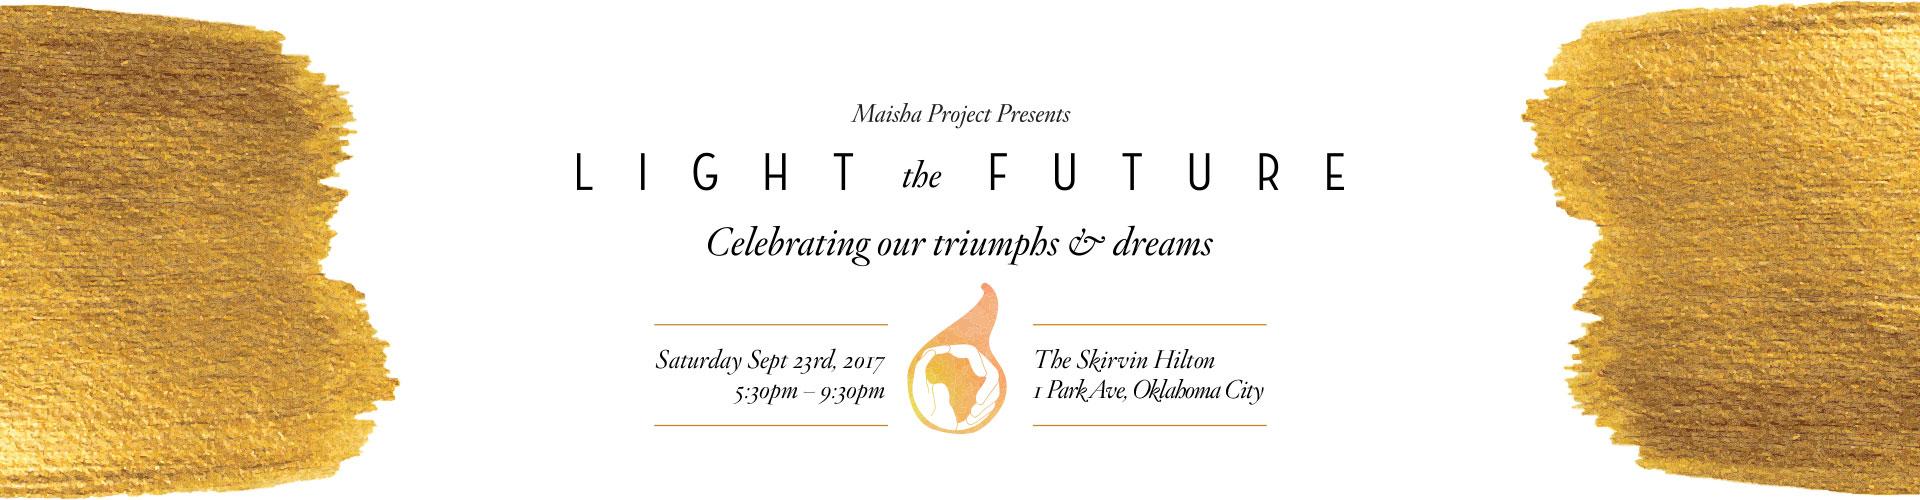 Light the Future